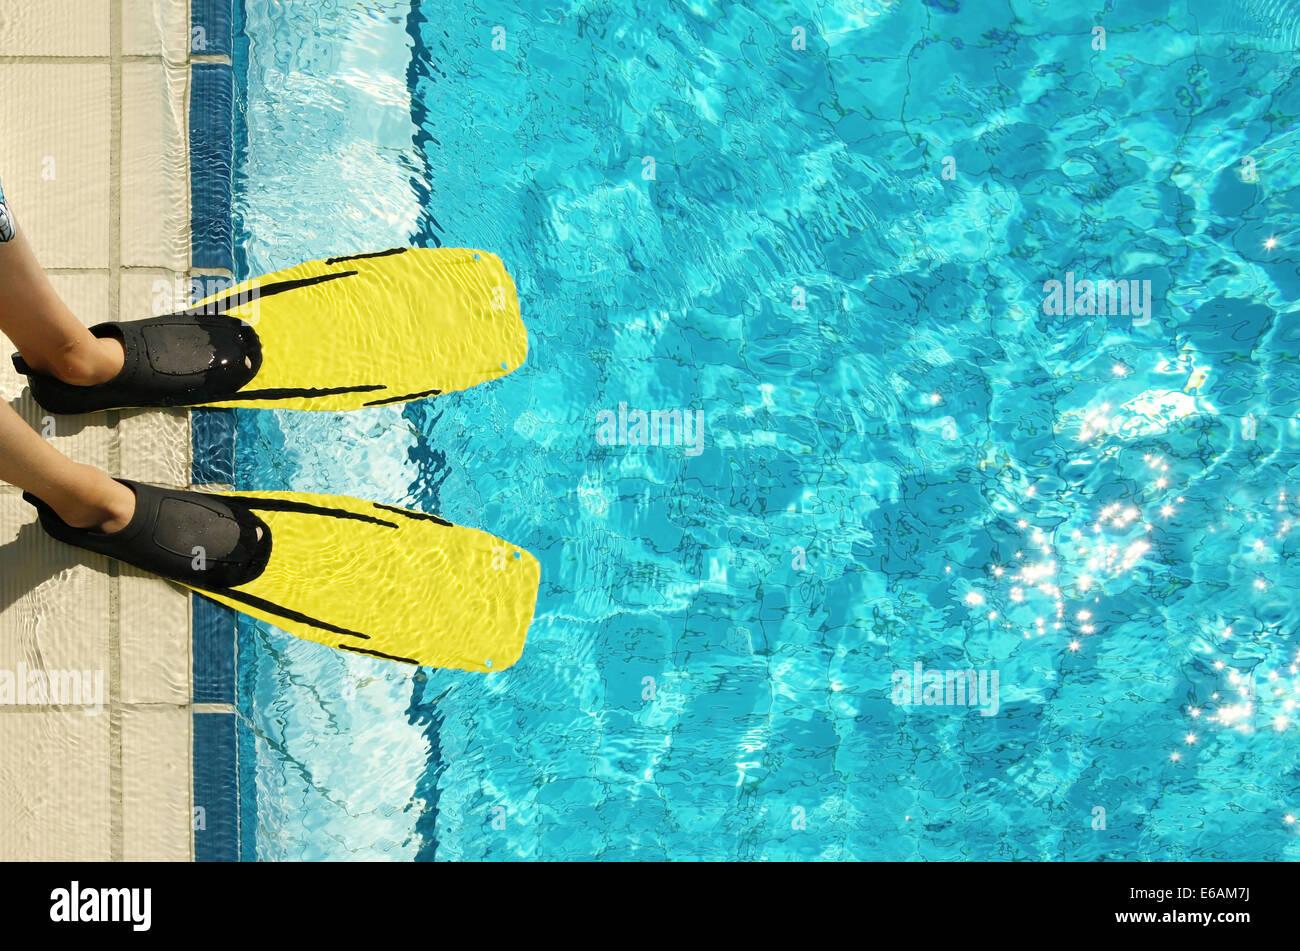 Schwimmbad, Beckenrand, flossen Stockbild